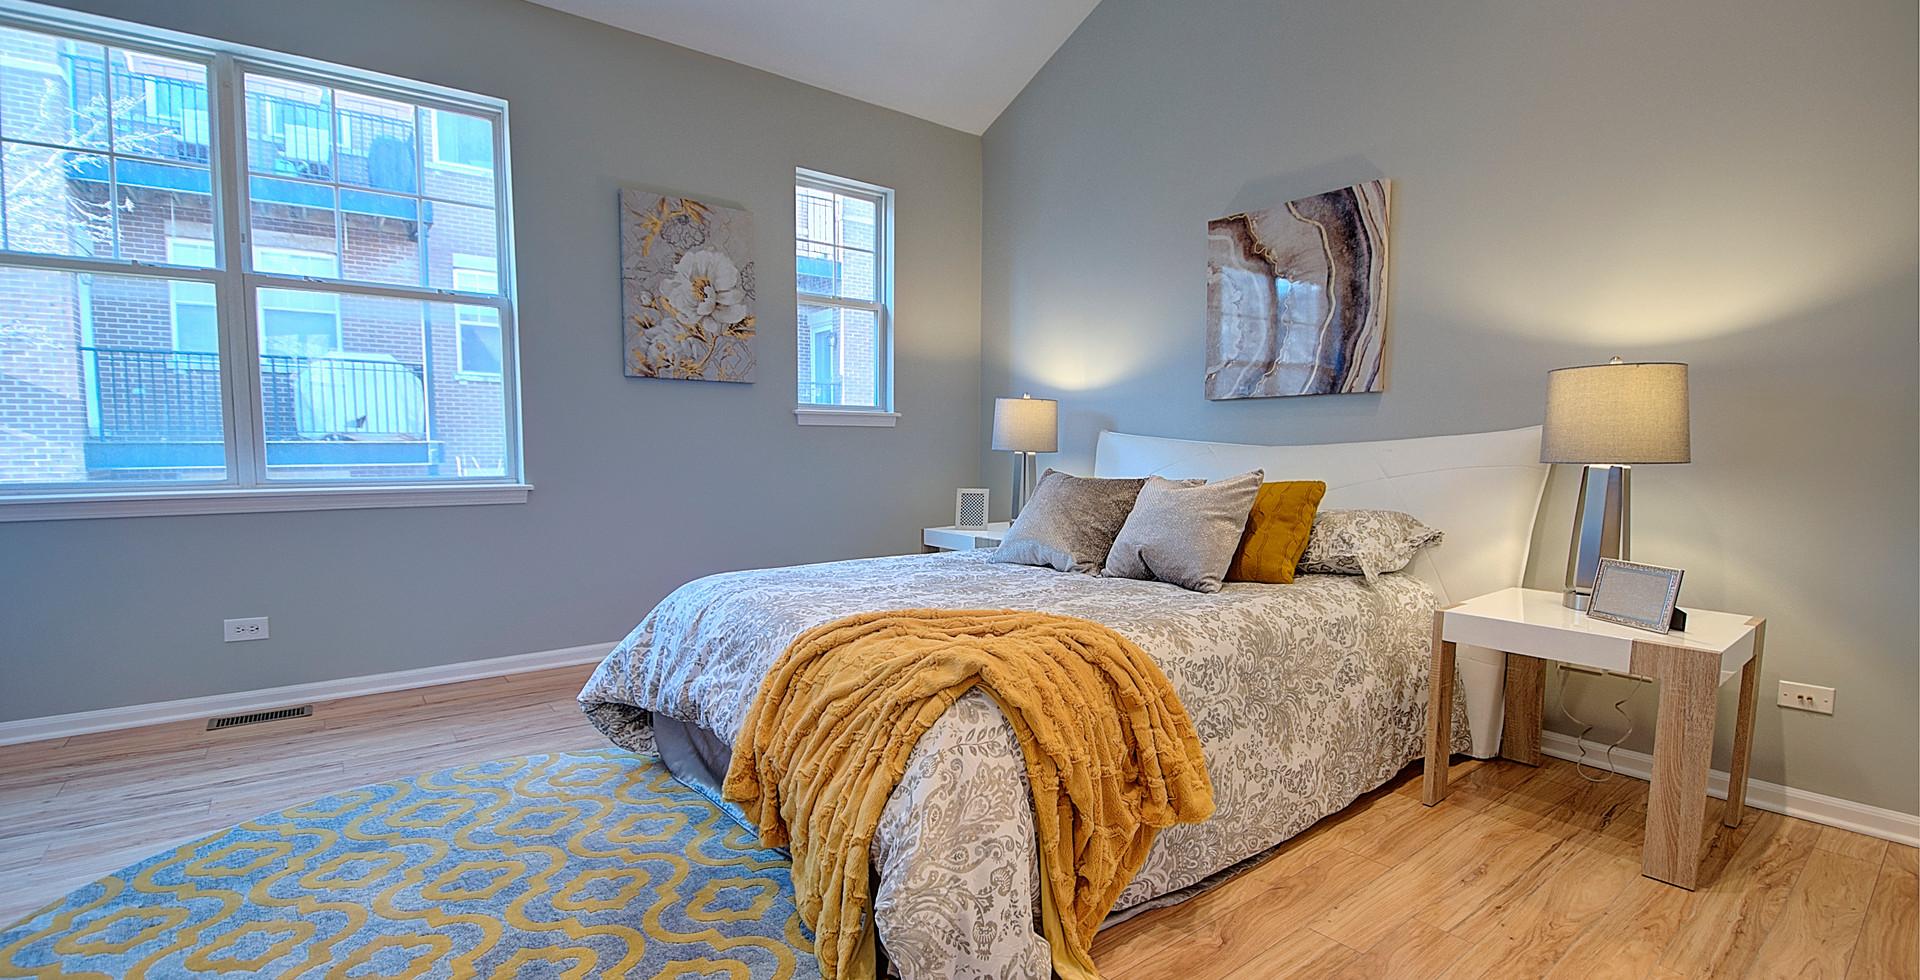 Bedroom in Chicago designed by MRM Home Design.jpg